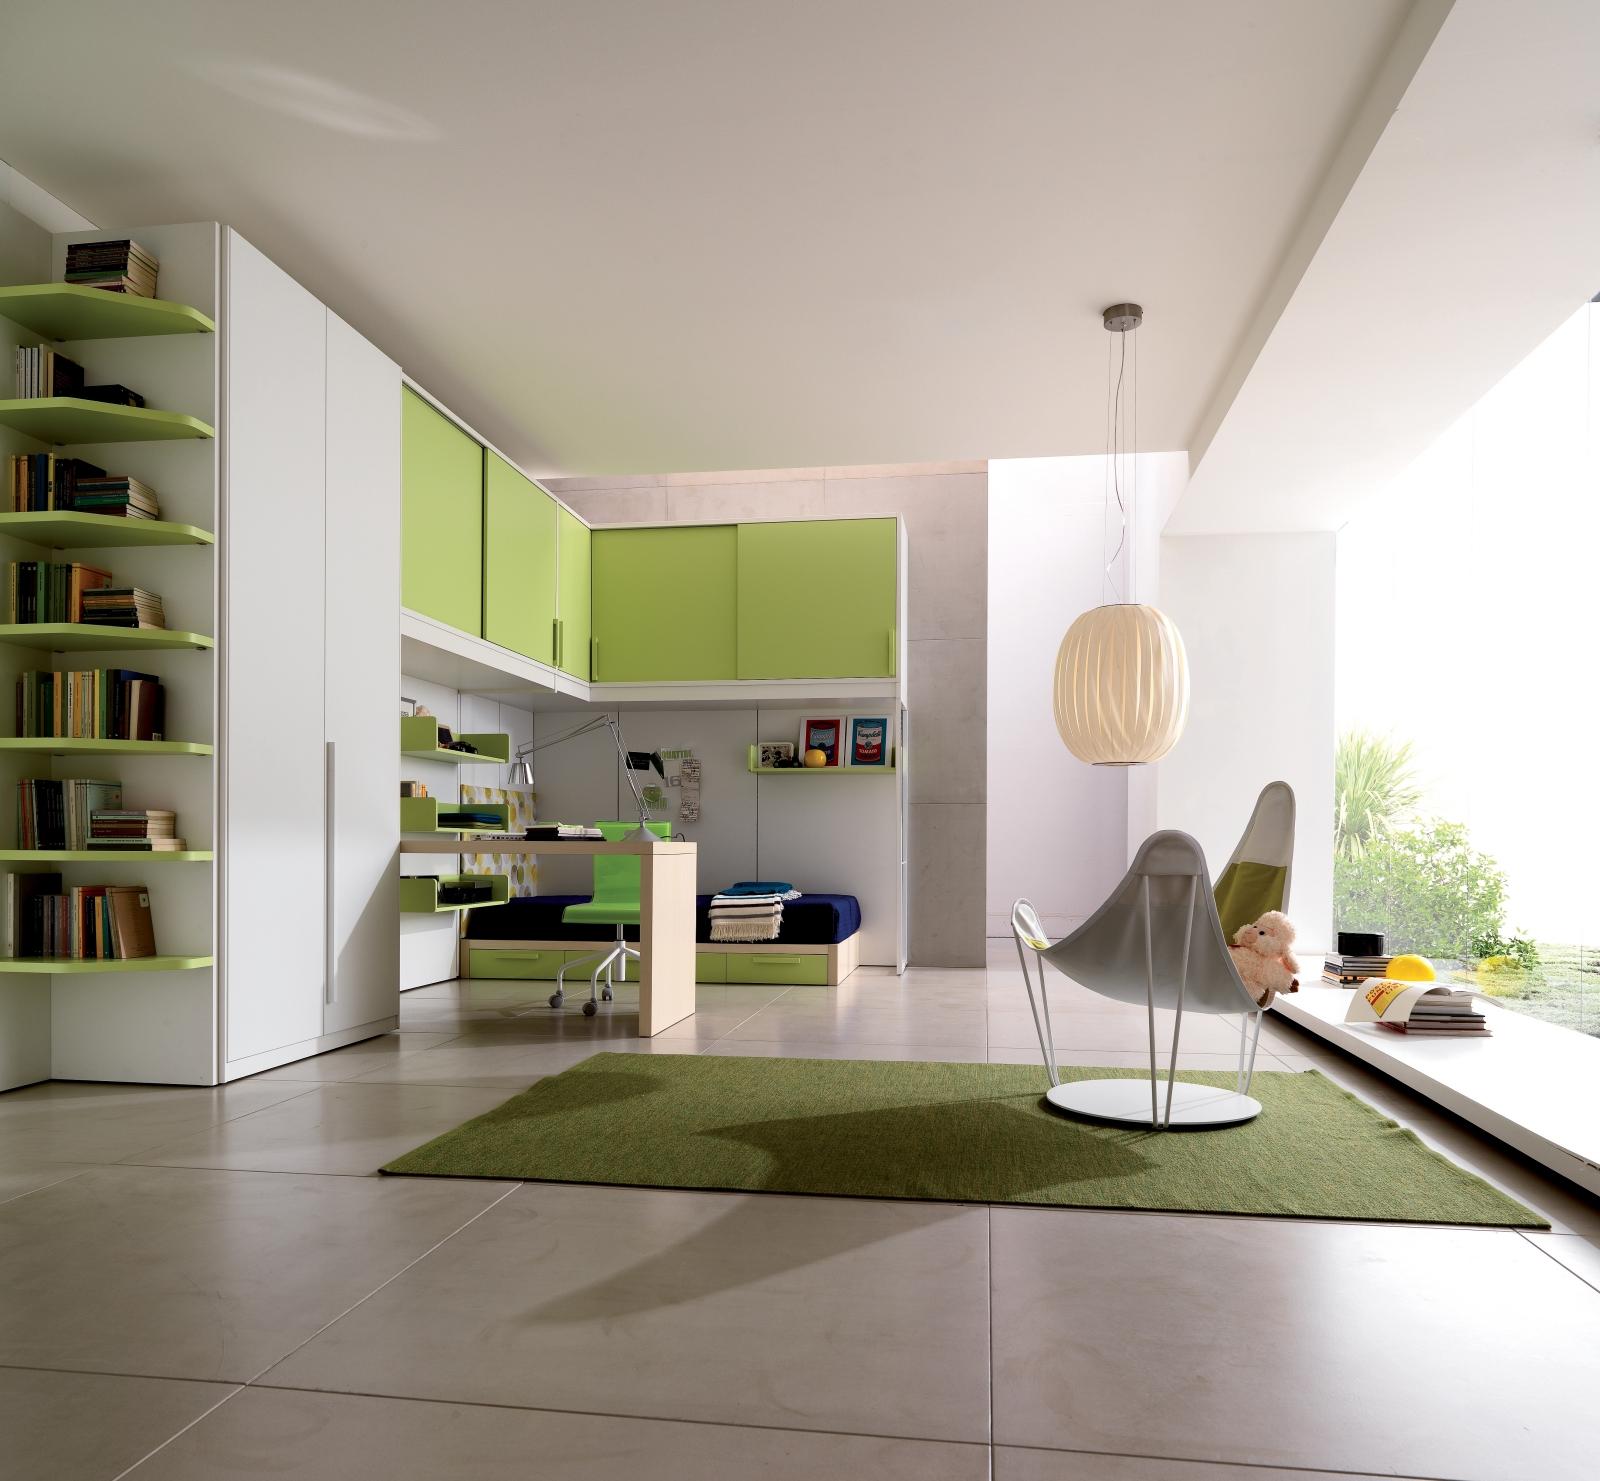 Twin Bedding Teen Room Designs From Zalf on Teenage Room Designs  id=69178